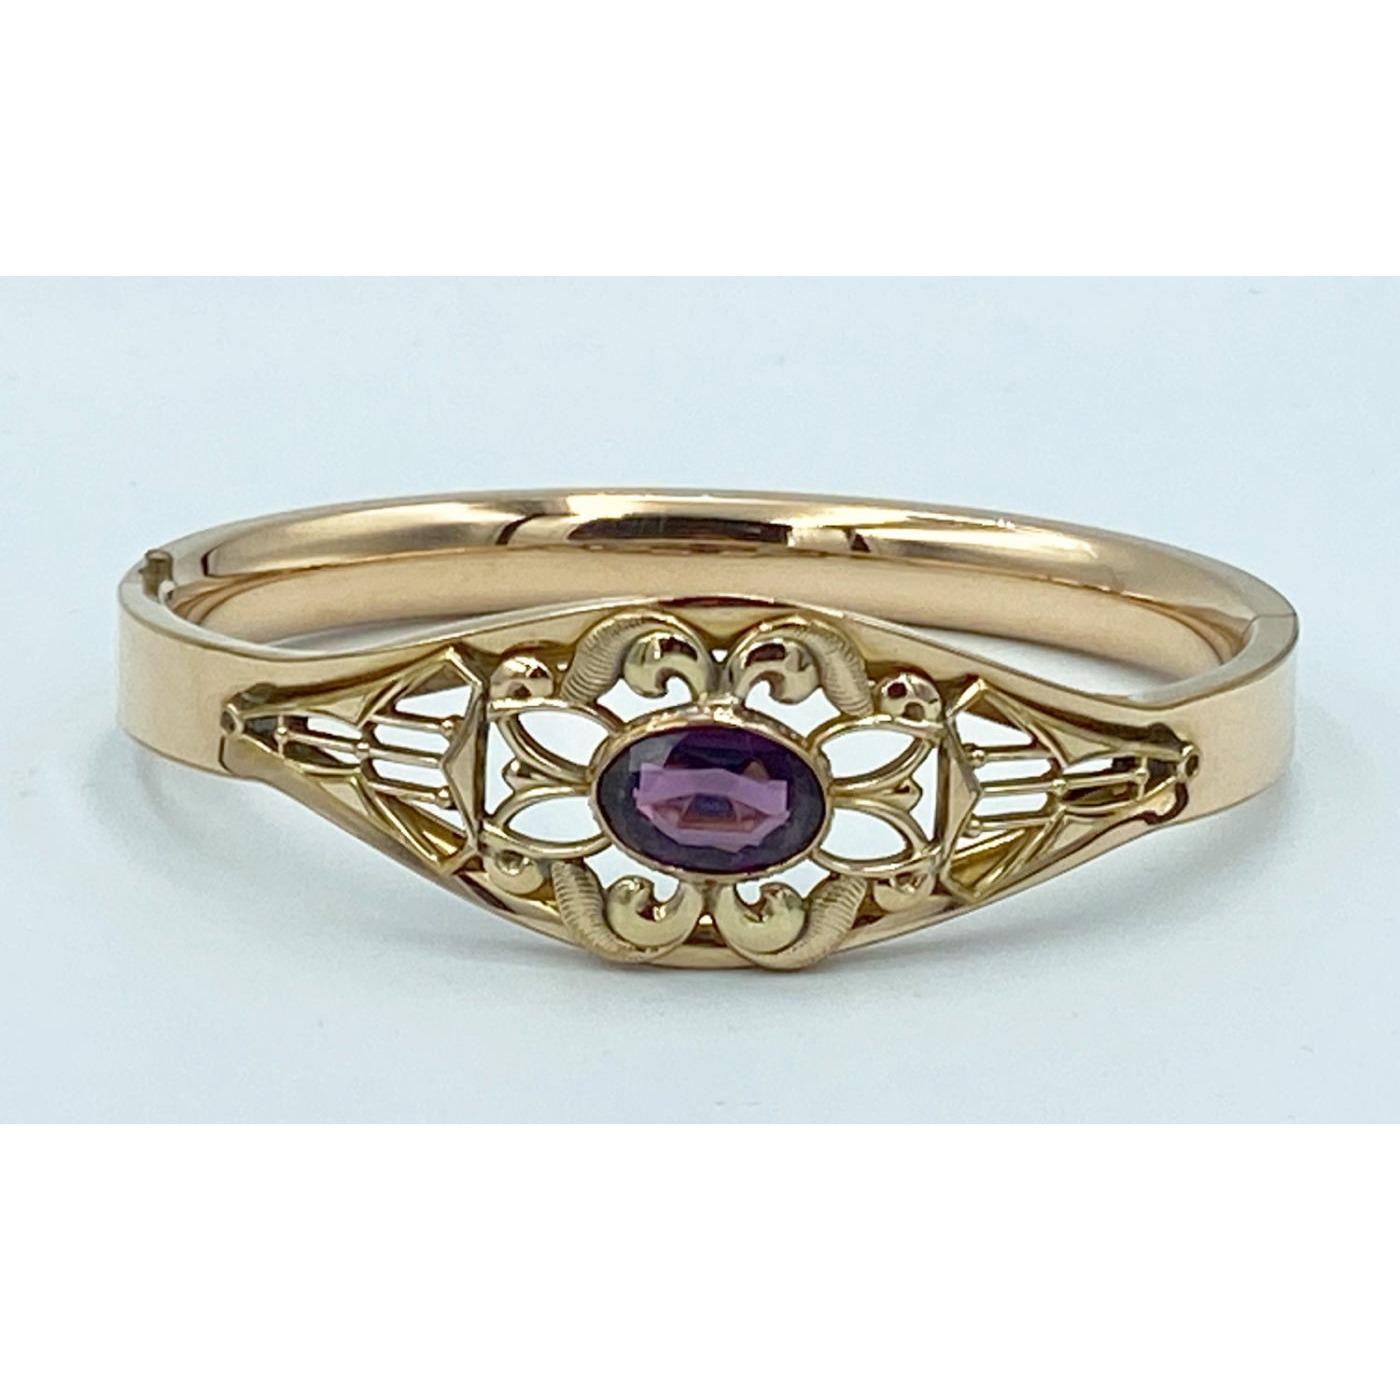 Sweet Wirework Surrounding Oval Purple Stone Engagement Bangle